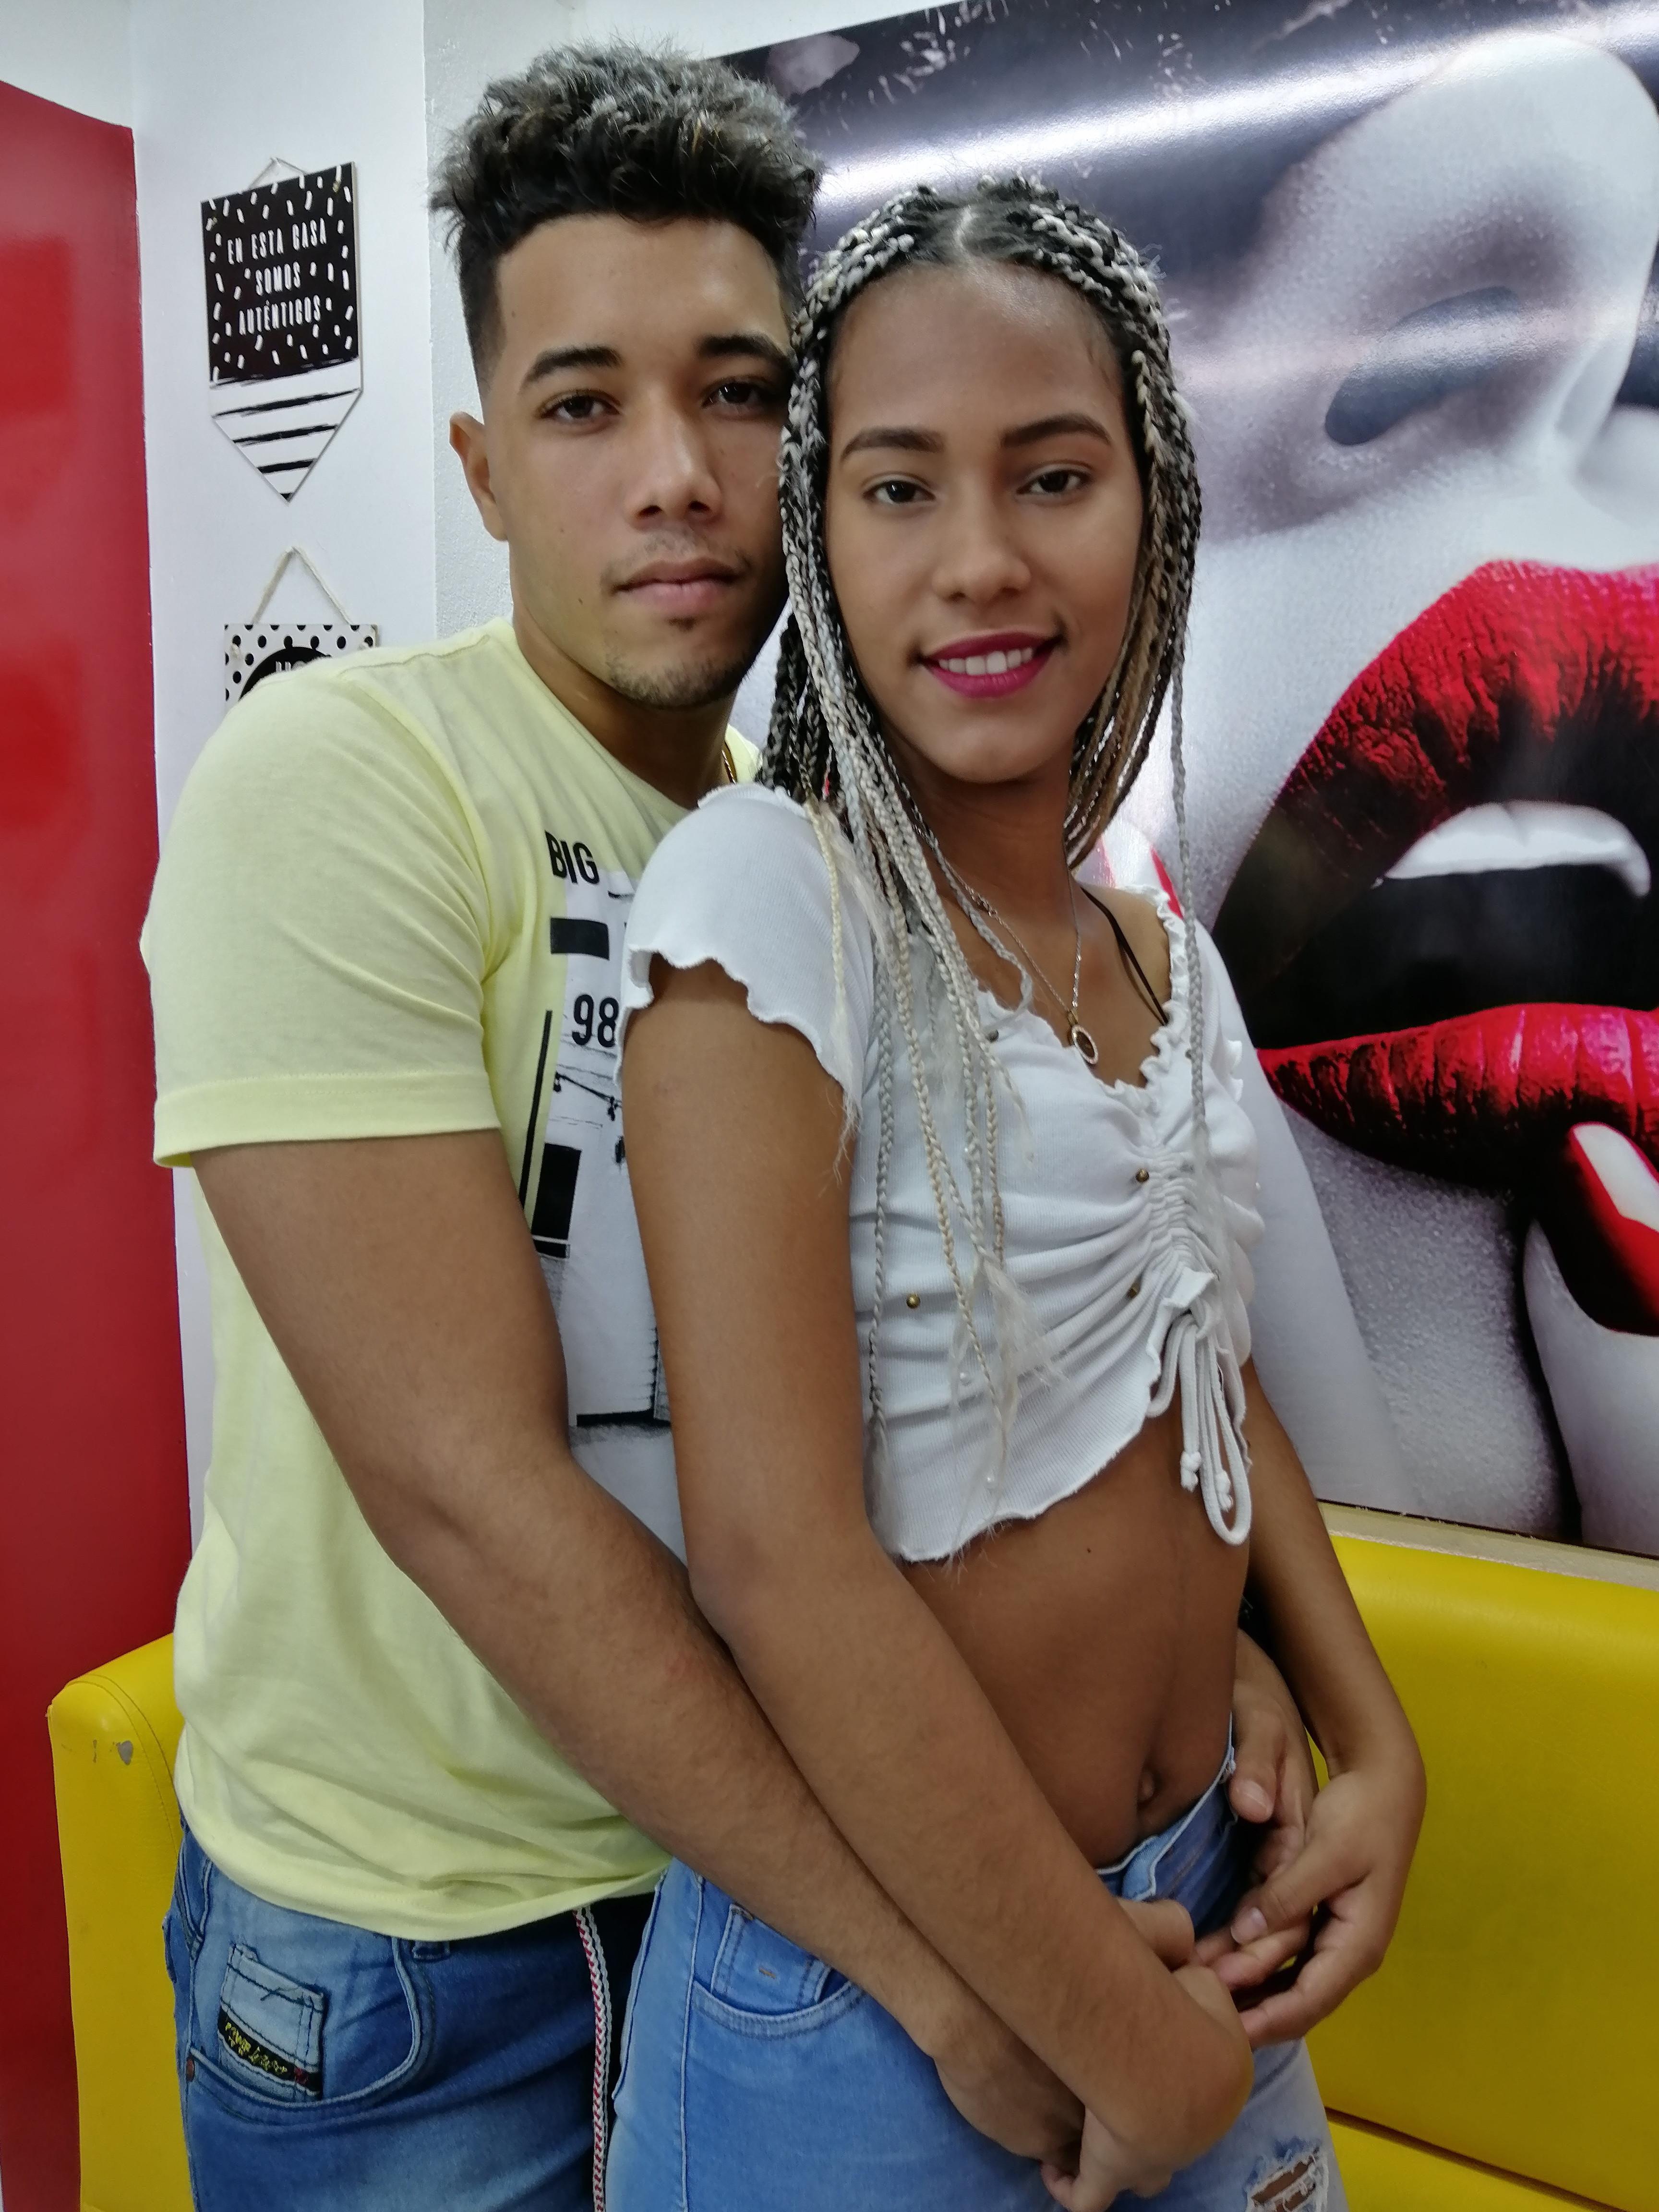 Couple lovers18?s=caqhgn0ztampij+ttphqfqsu8jfv9o7xbensr937ze4=